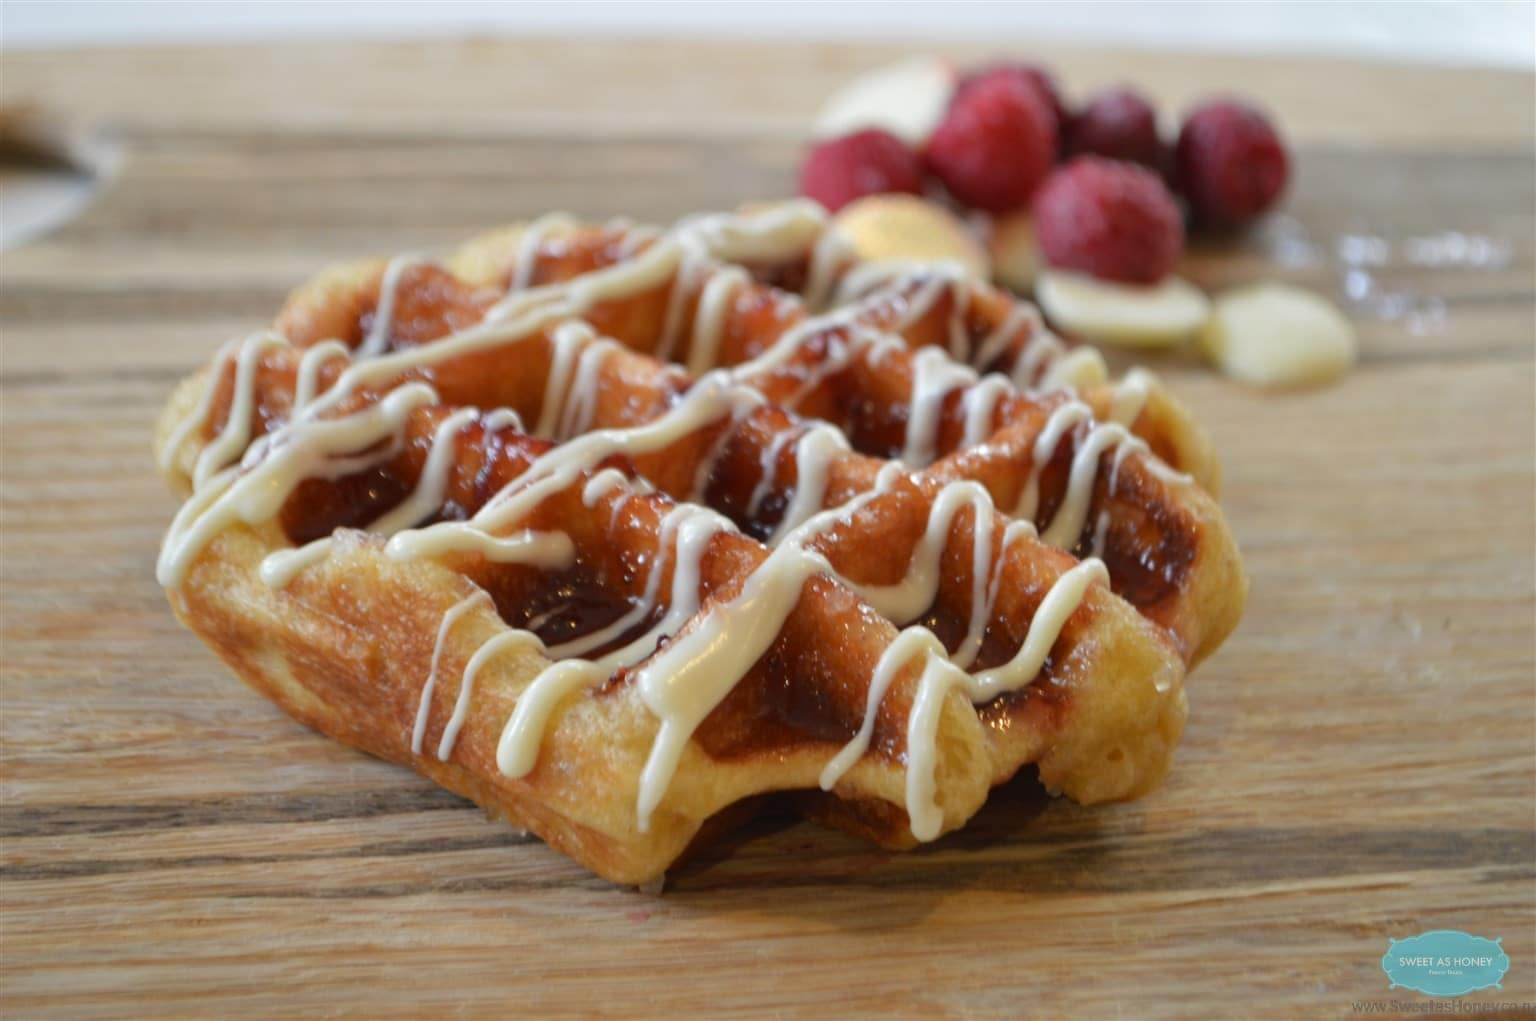 Liege Waffles - SWEETASHONEY